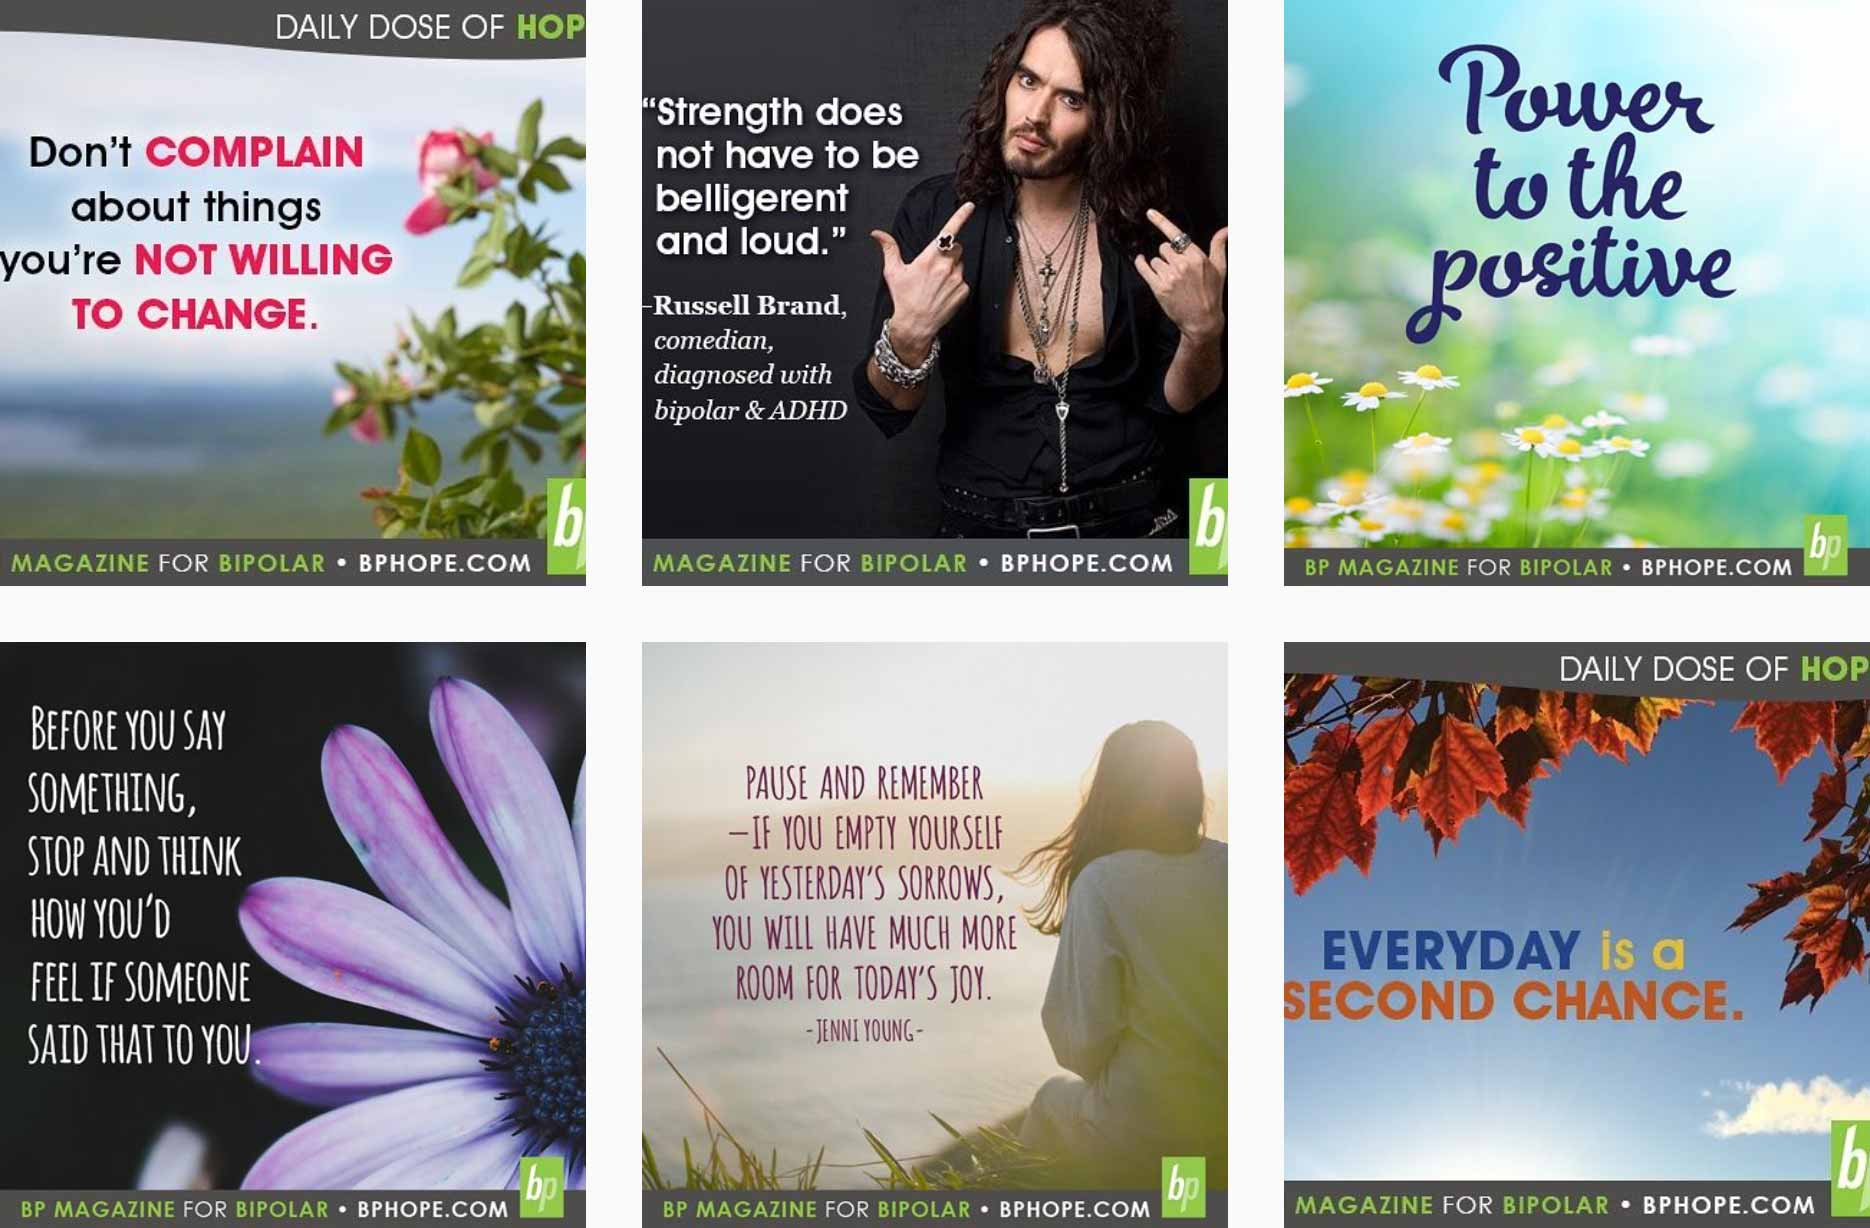 bp-magazine-feeds-bipolar-disorder-instagram-accounts-oc87-recovery-diaries-2000x1050